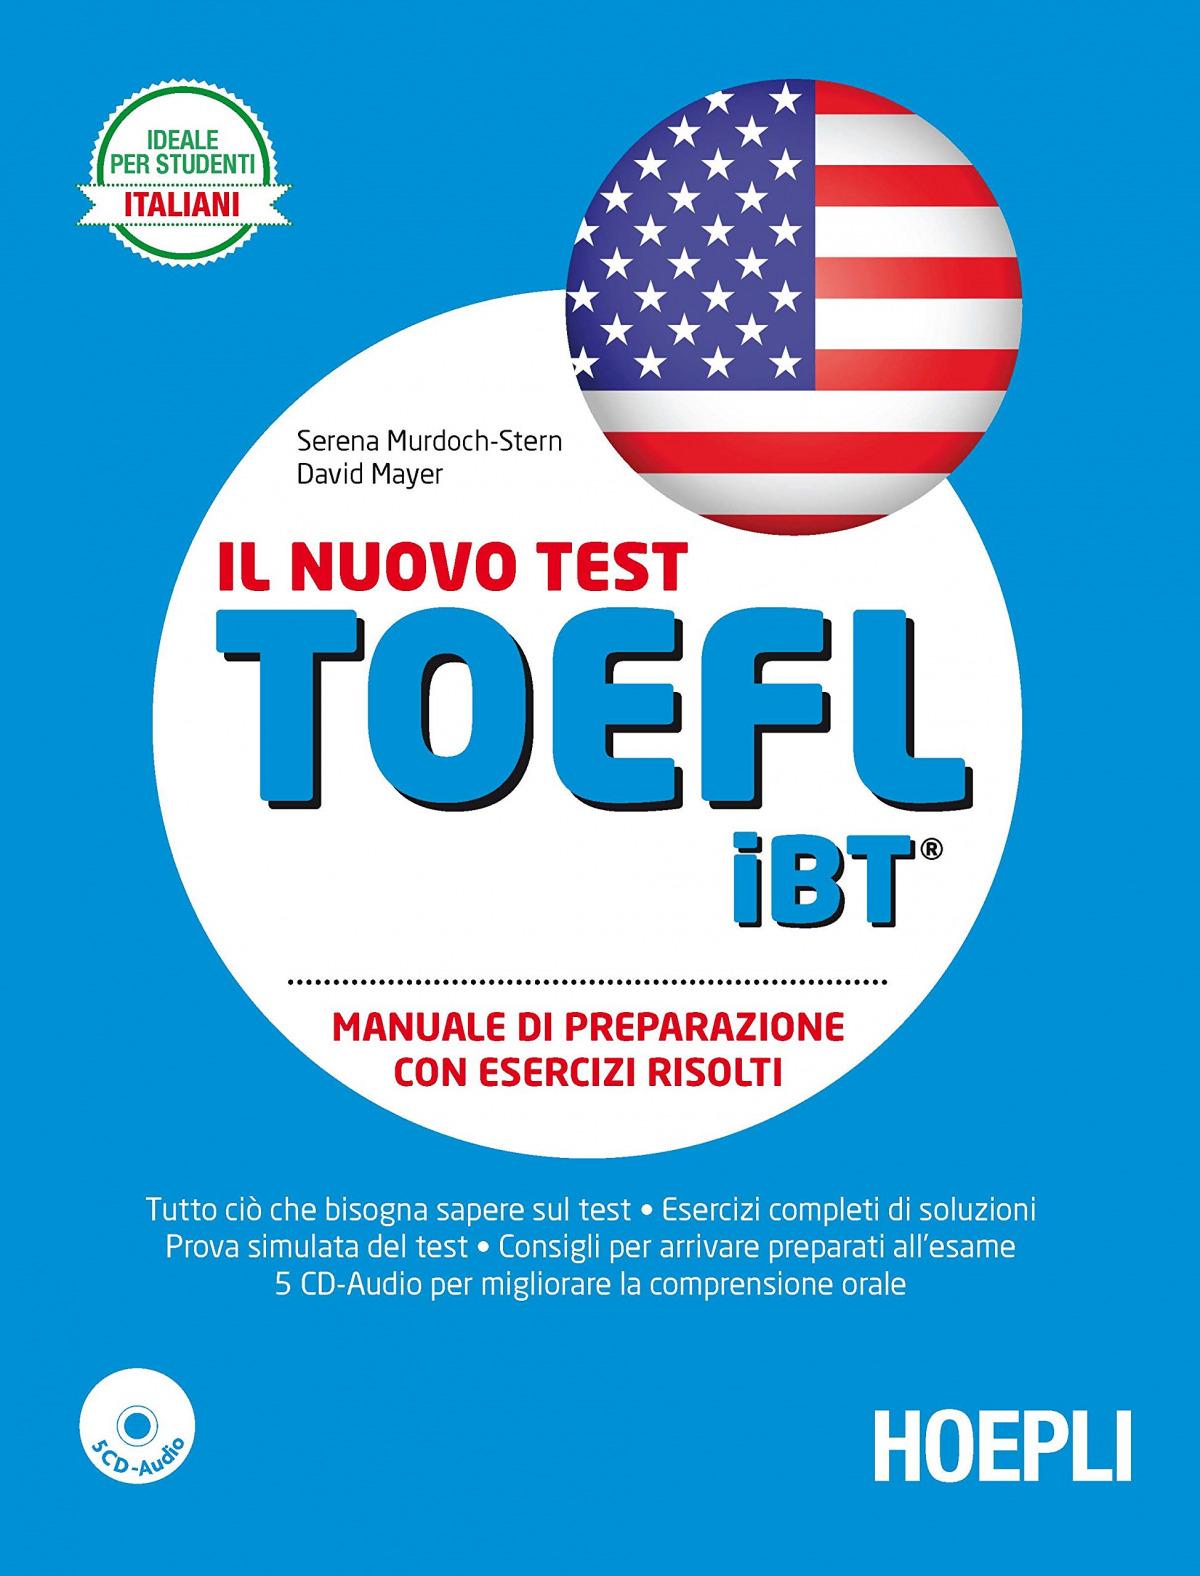 Il nuovo test TOEFL iBT